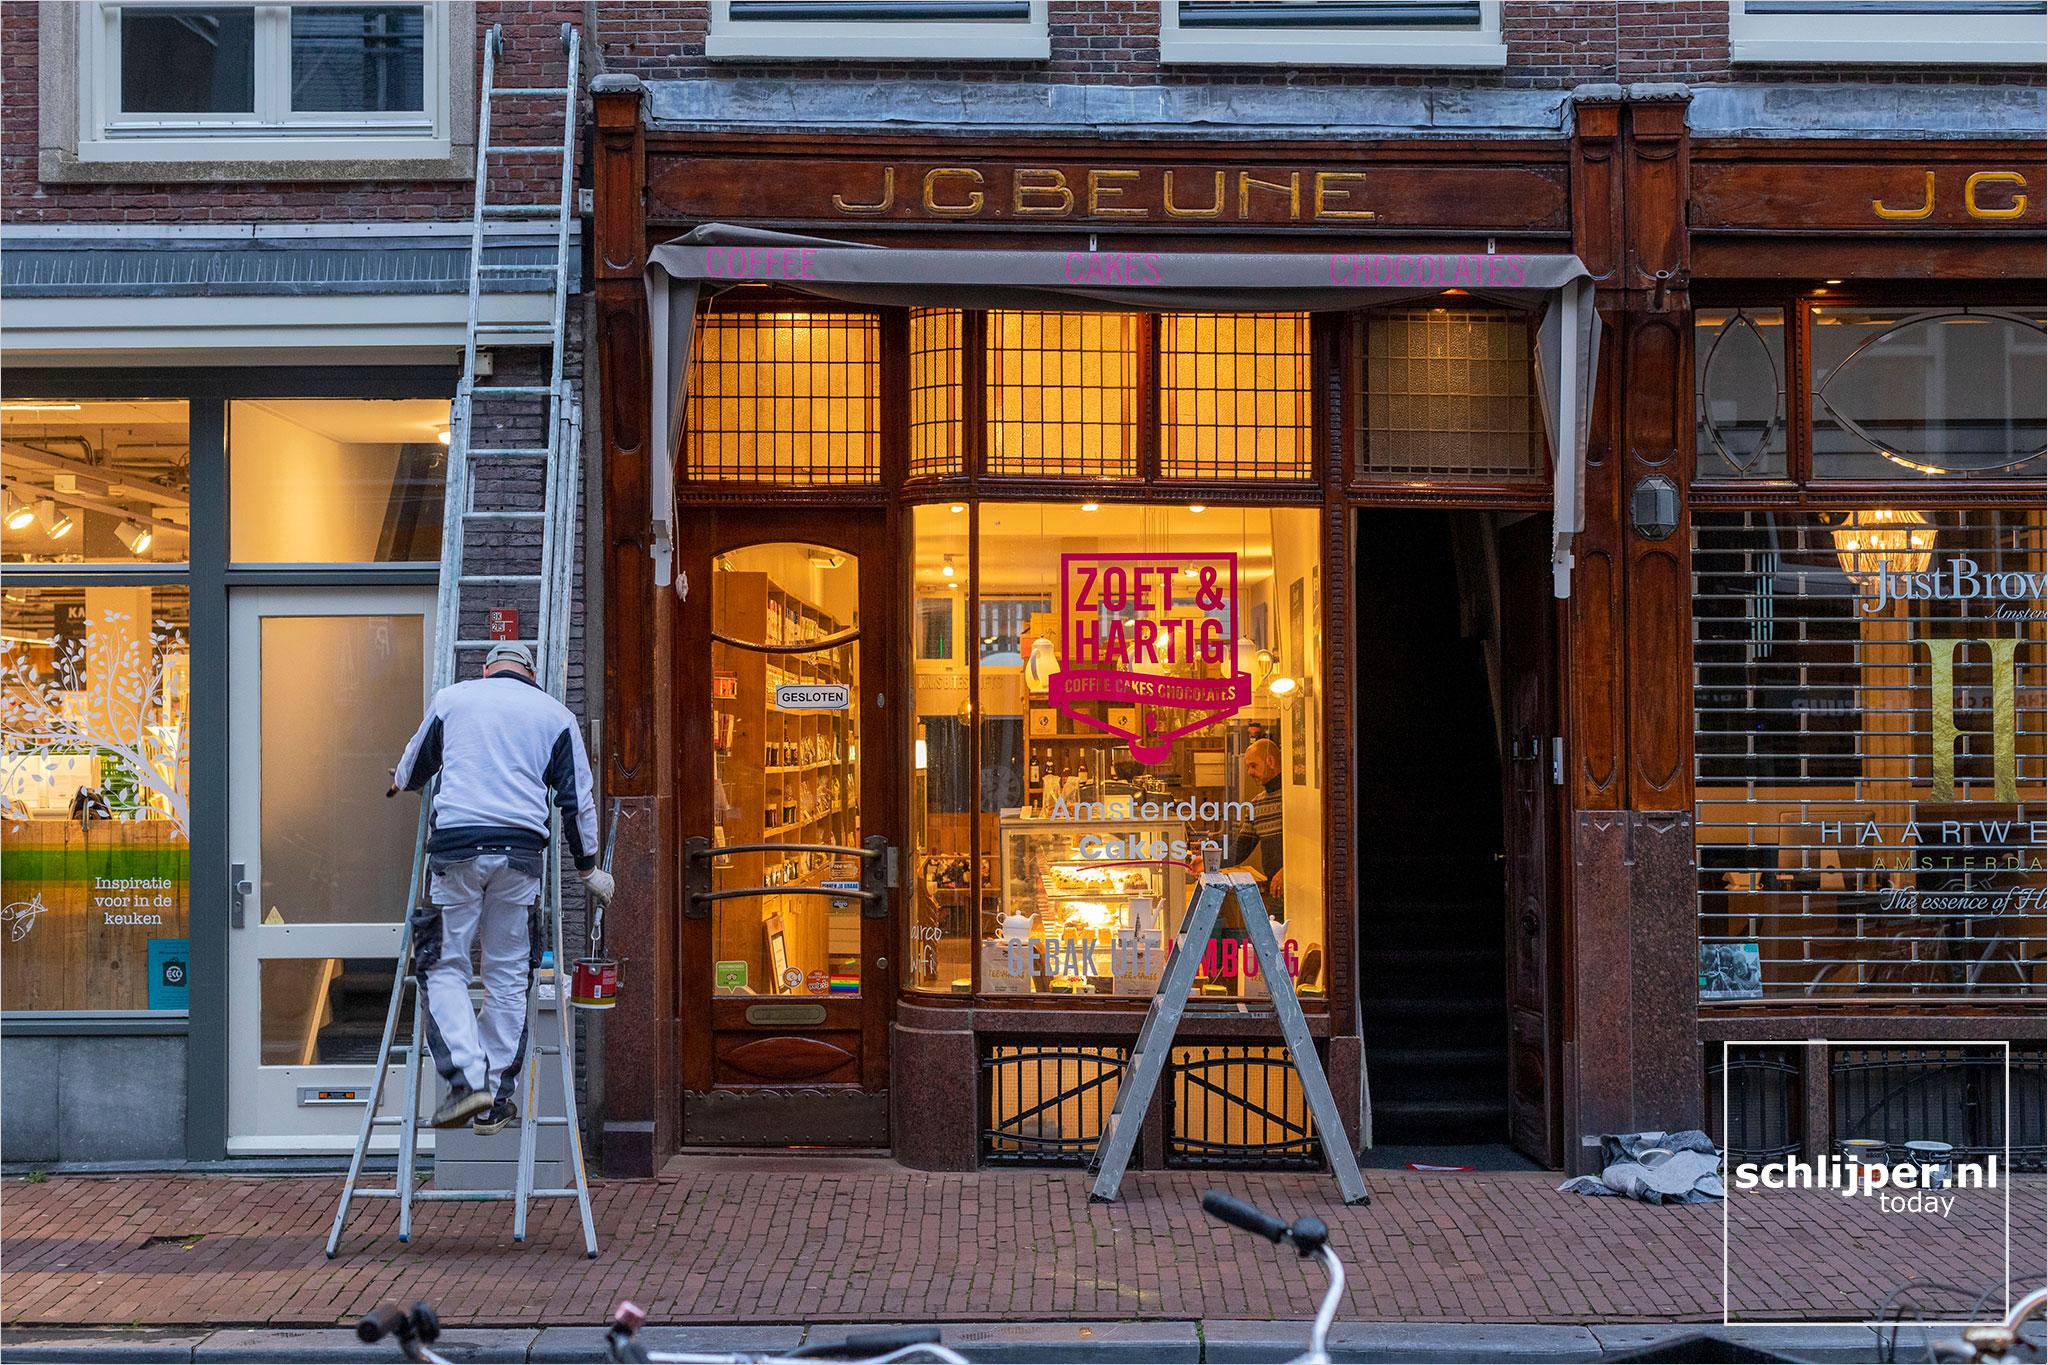 The Netherlands, Amsterdam, 14 oktober 2021